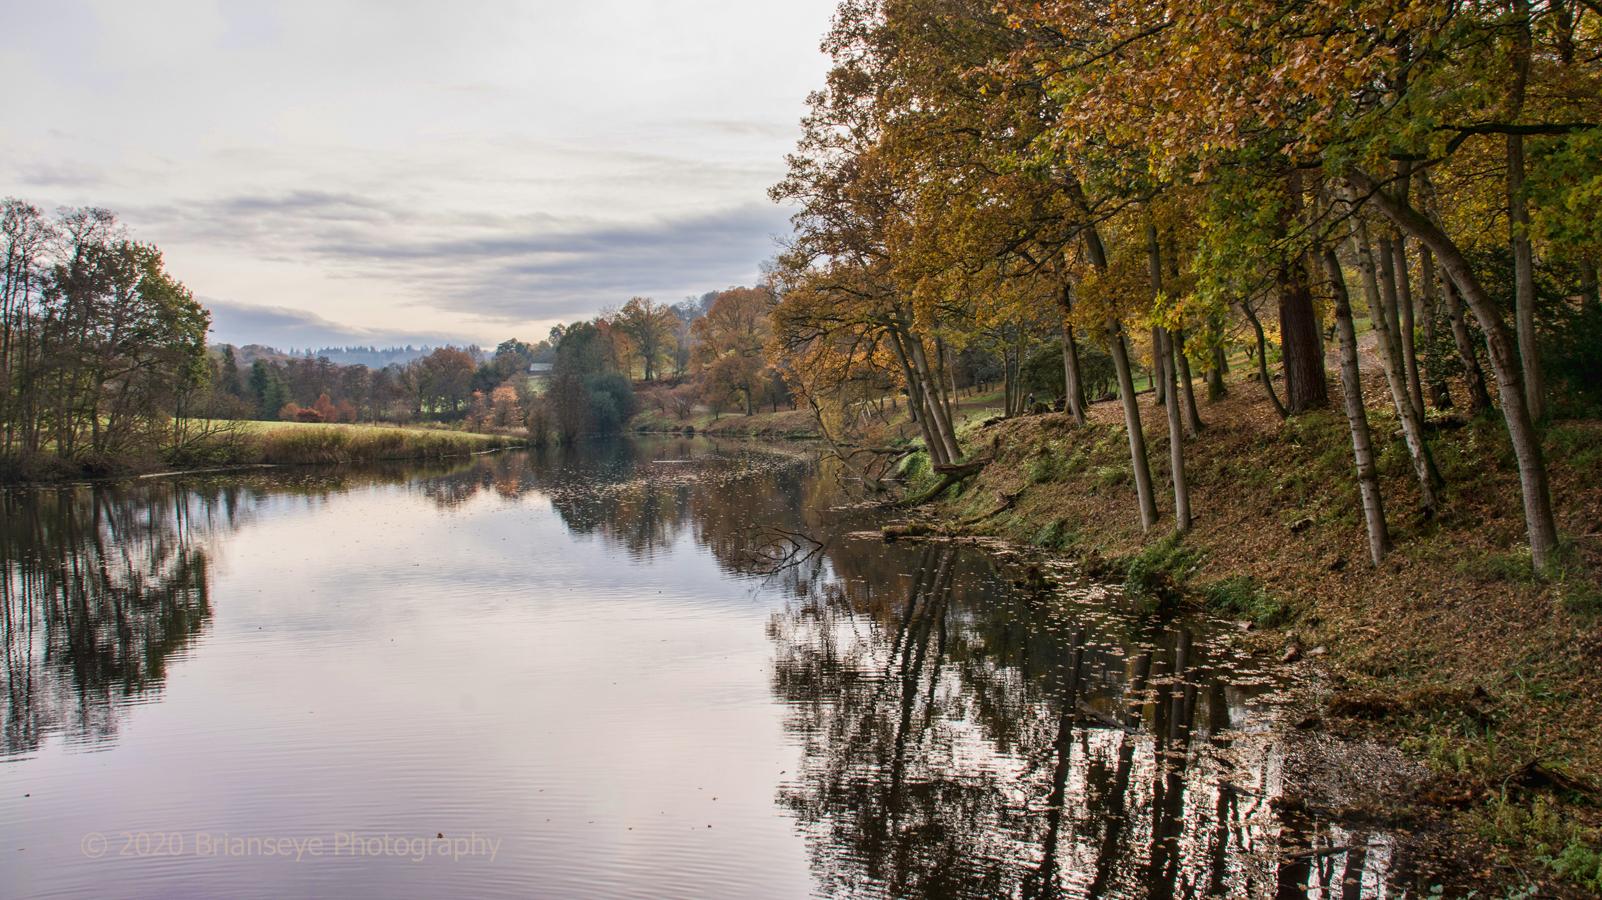 Brianseye Landscape (127)